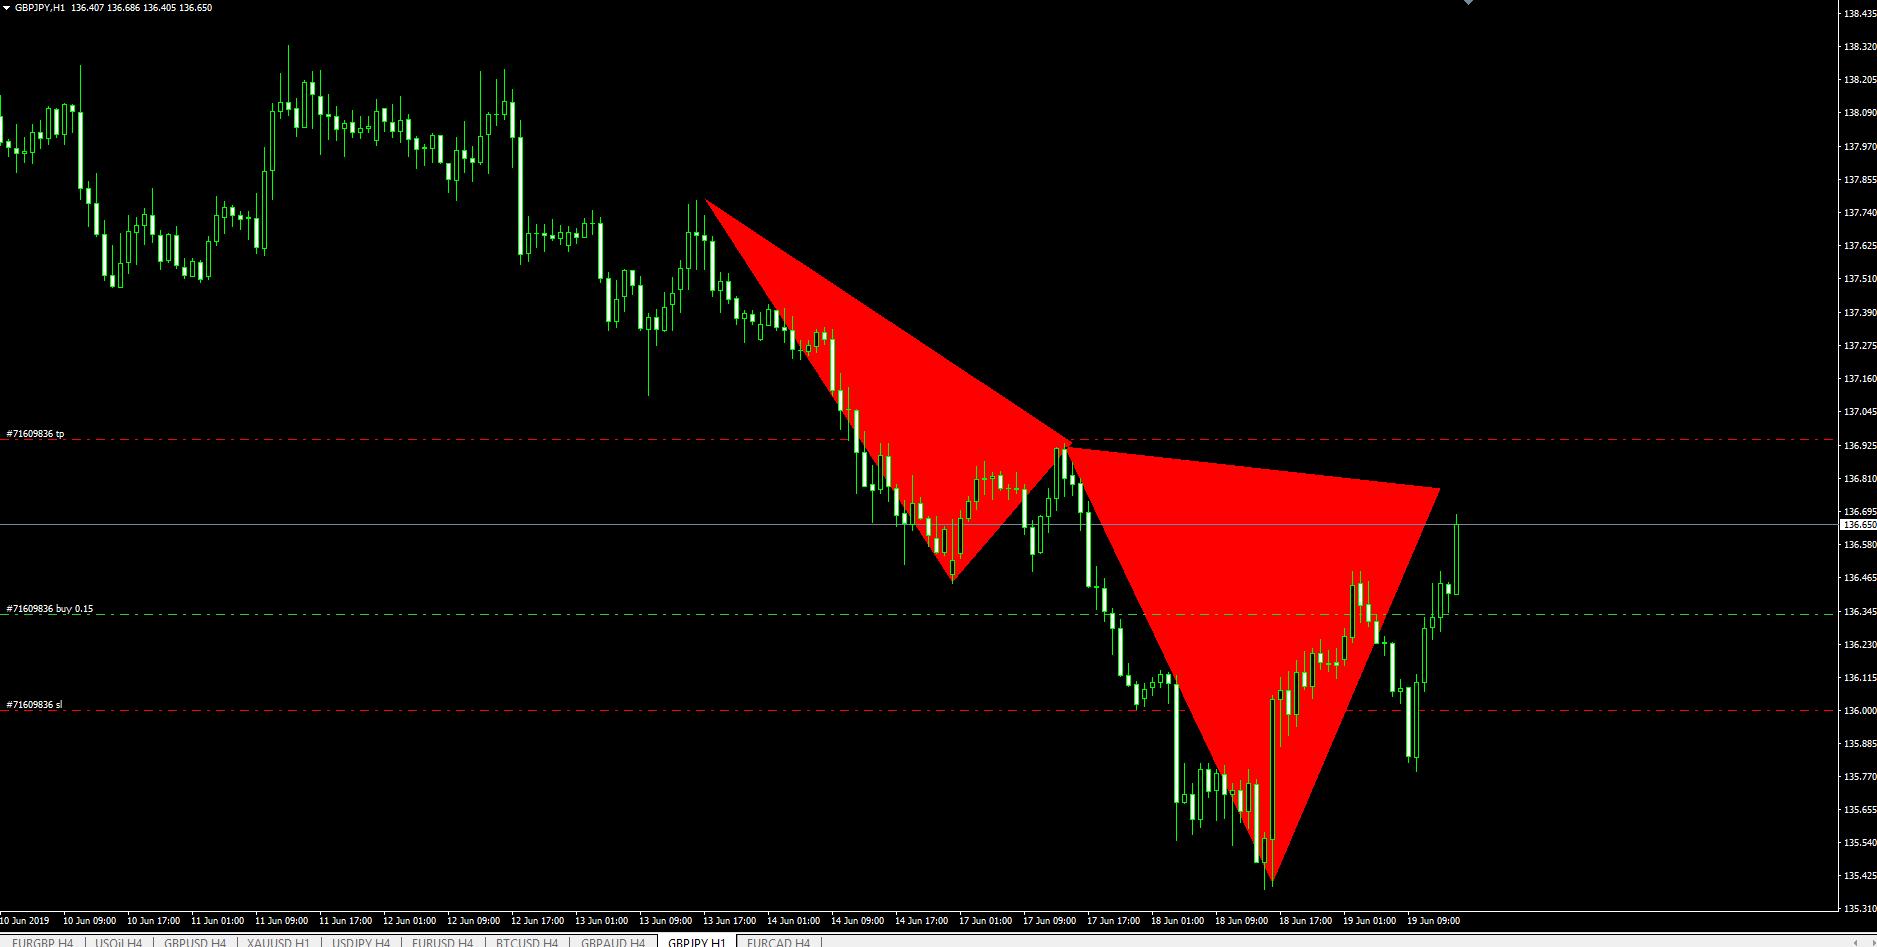 GBPJPY M30 Chart I SHS Pattern | Chartreaderpro